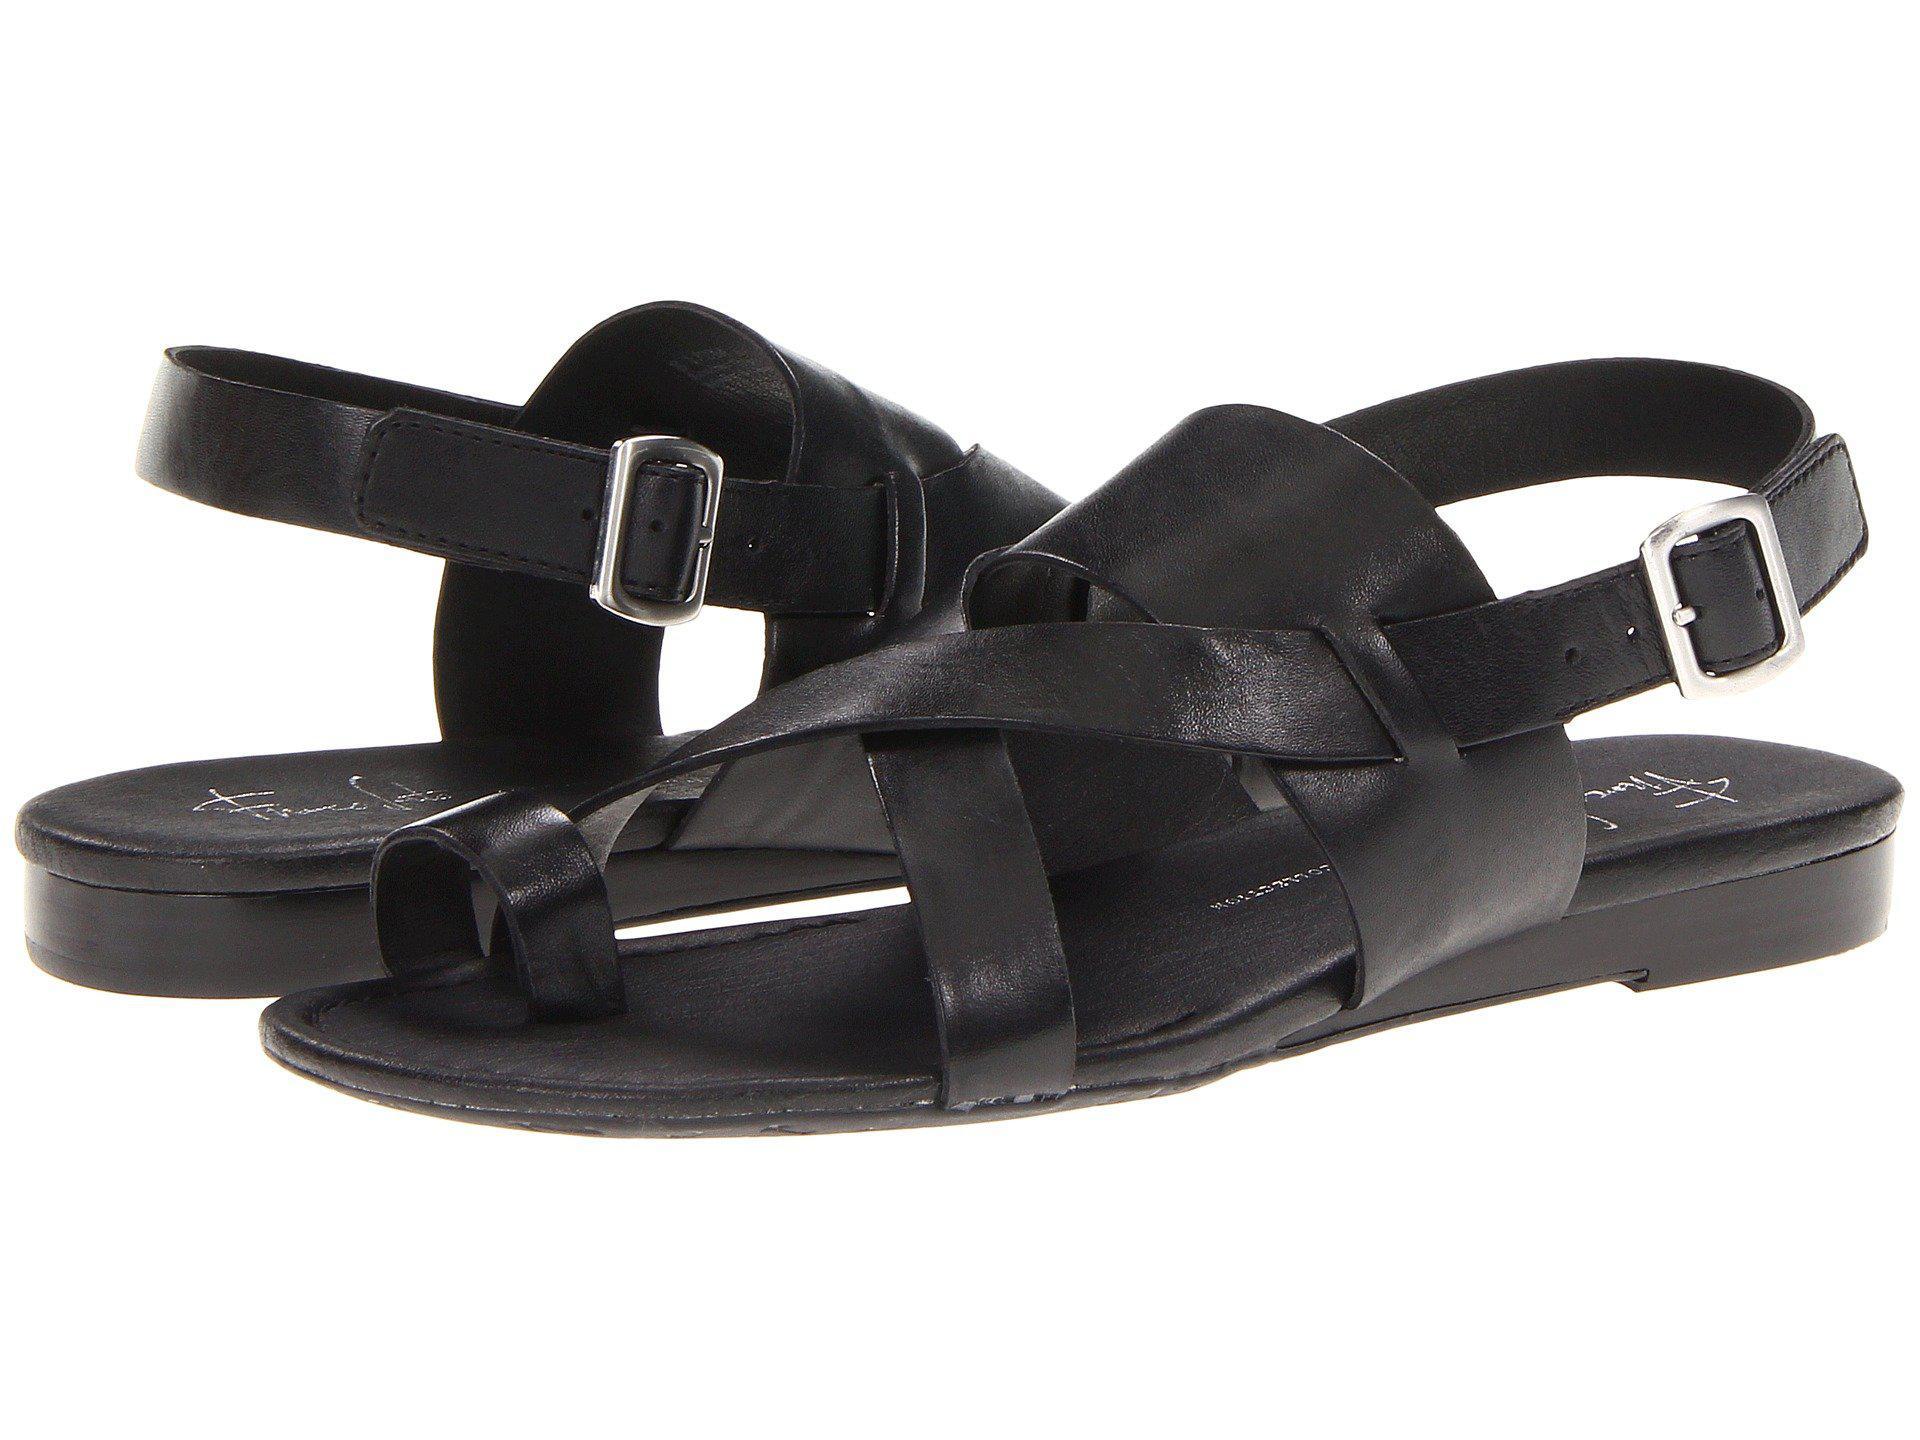 eaf7e4b20f4 Lyst - Franco Sarto Gia By Sarto (adobe Rose) Women s Sandals in Black